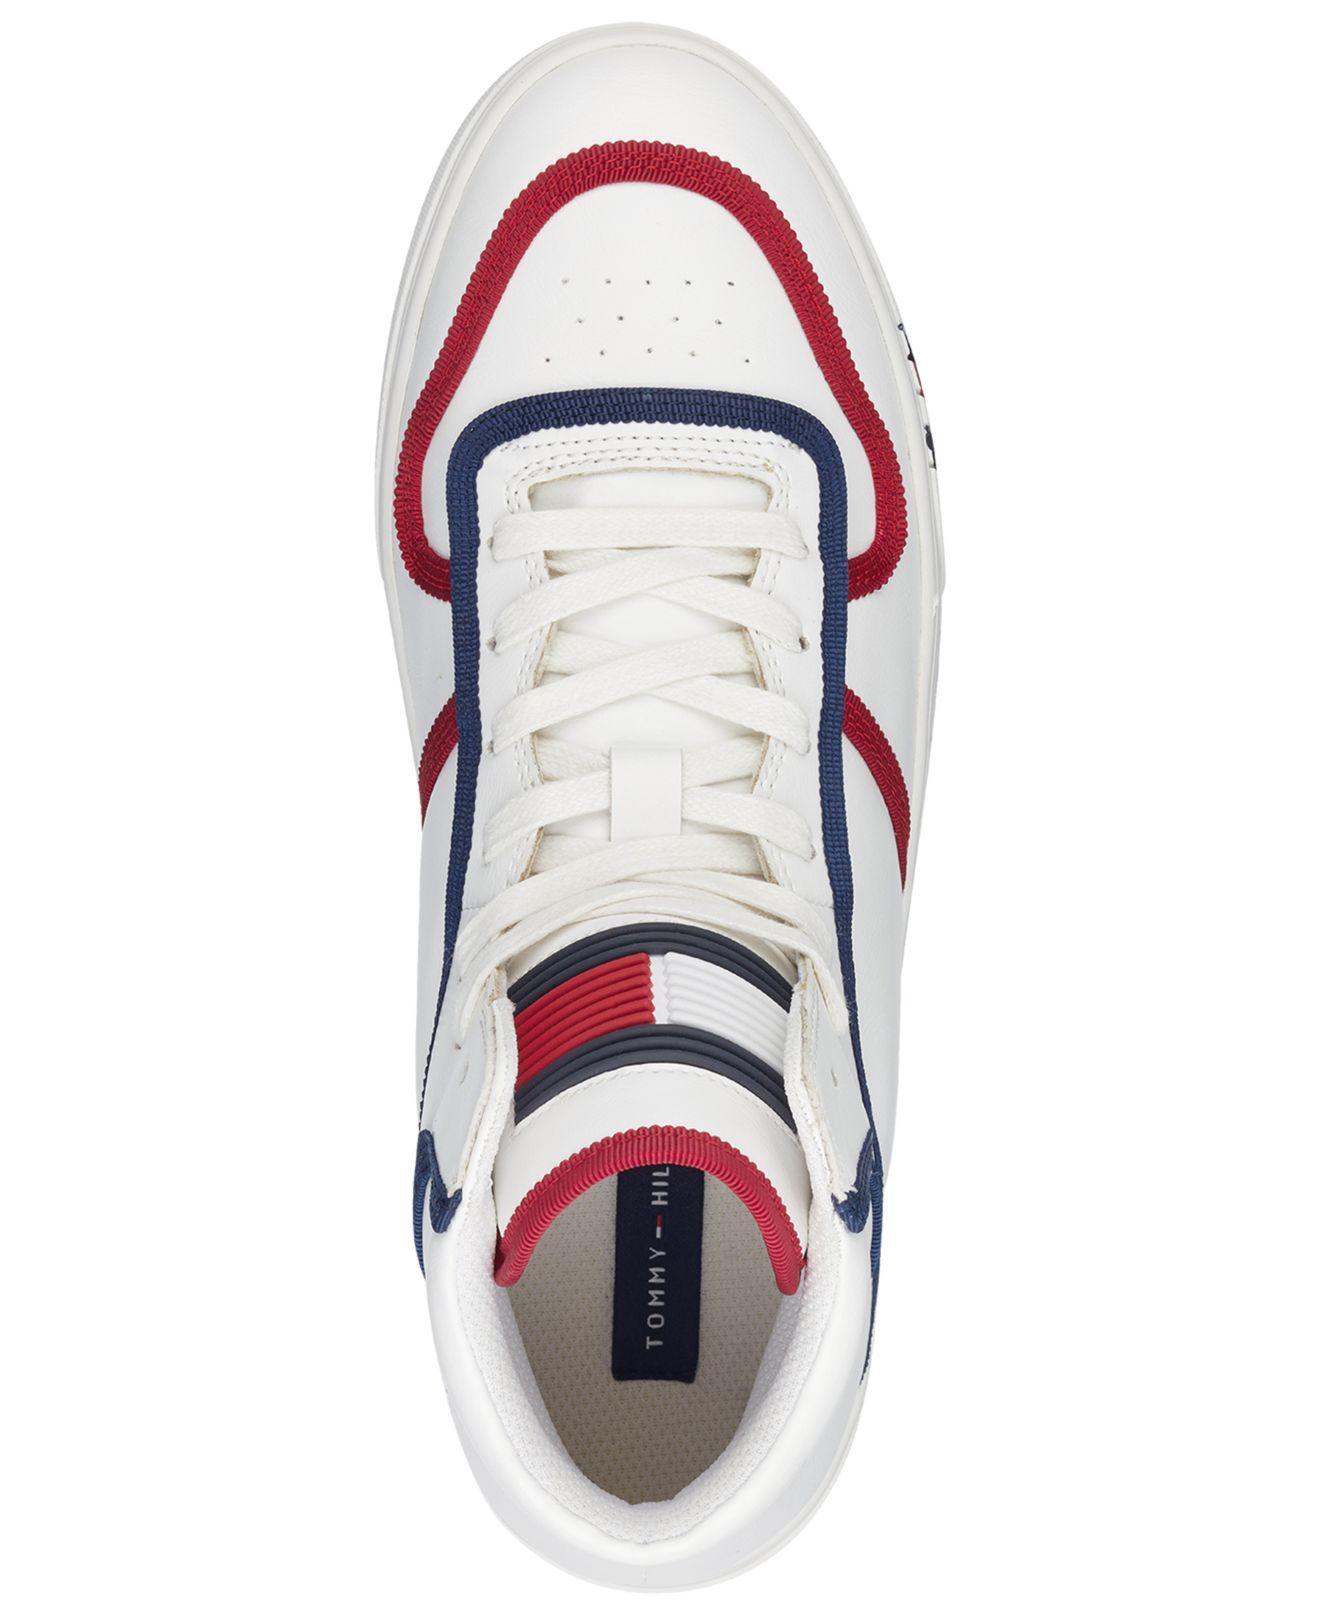 0d99da3c Tommy Hilfiger White Japan High Top Sneakers for men. View fullscreen